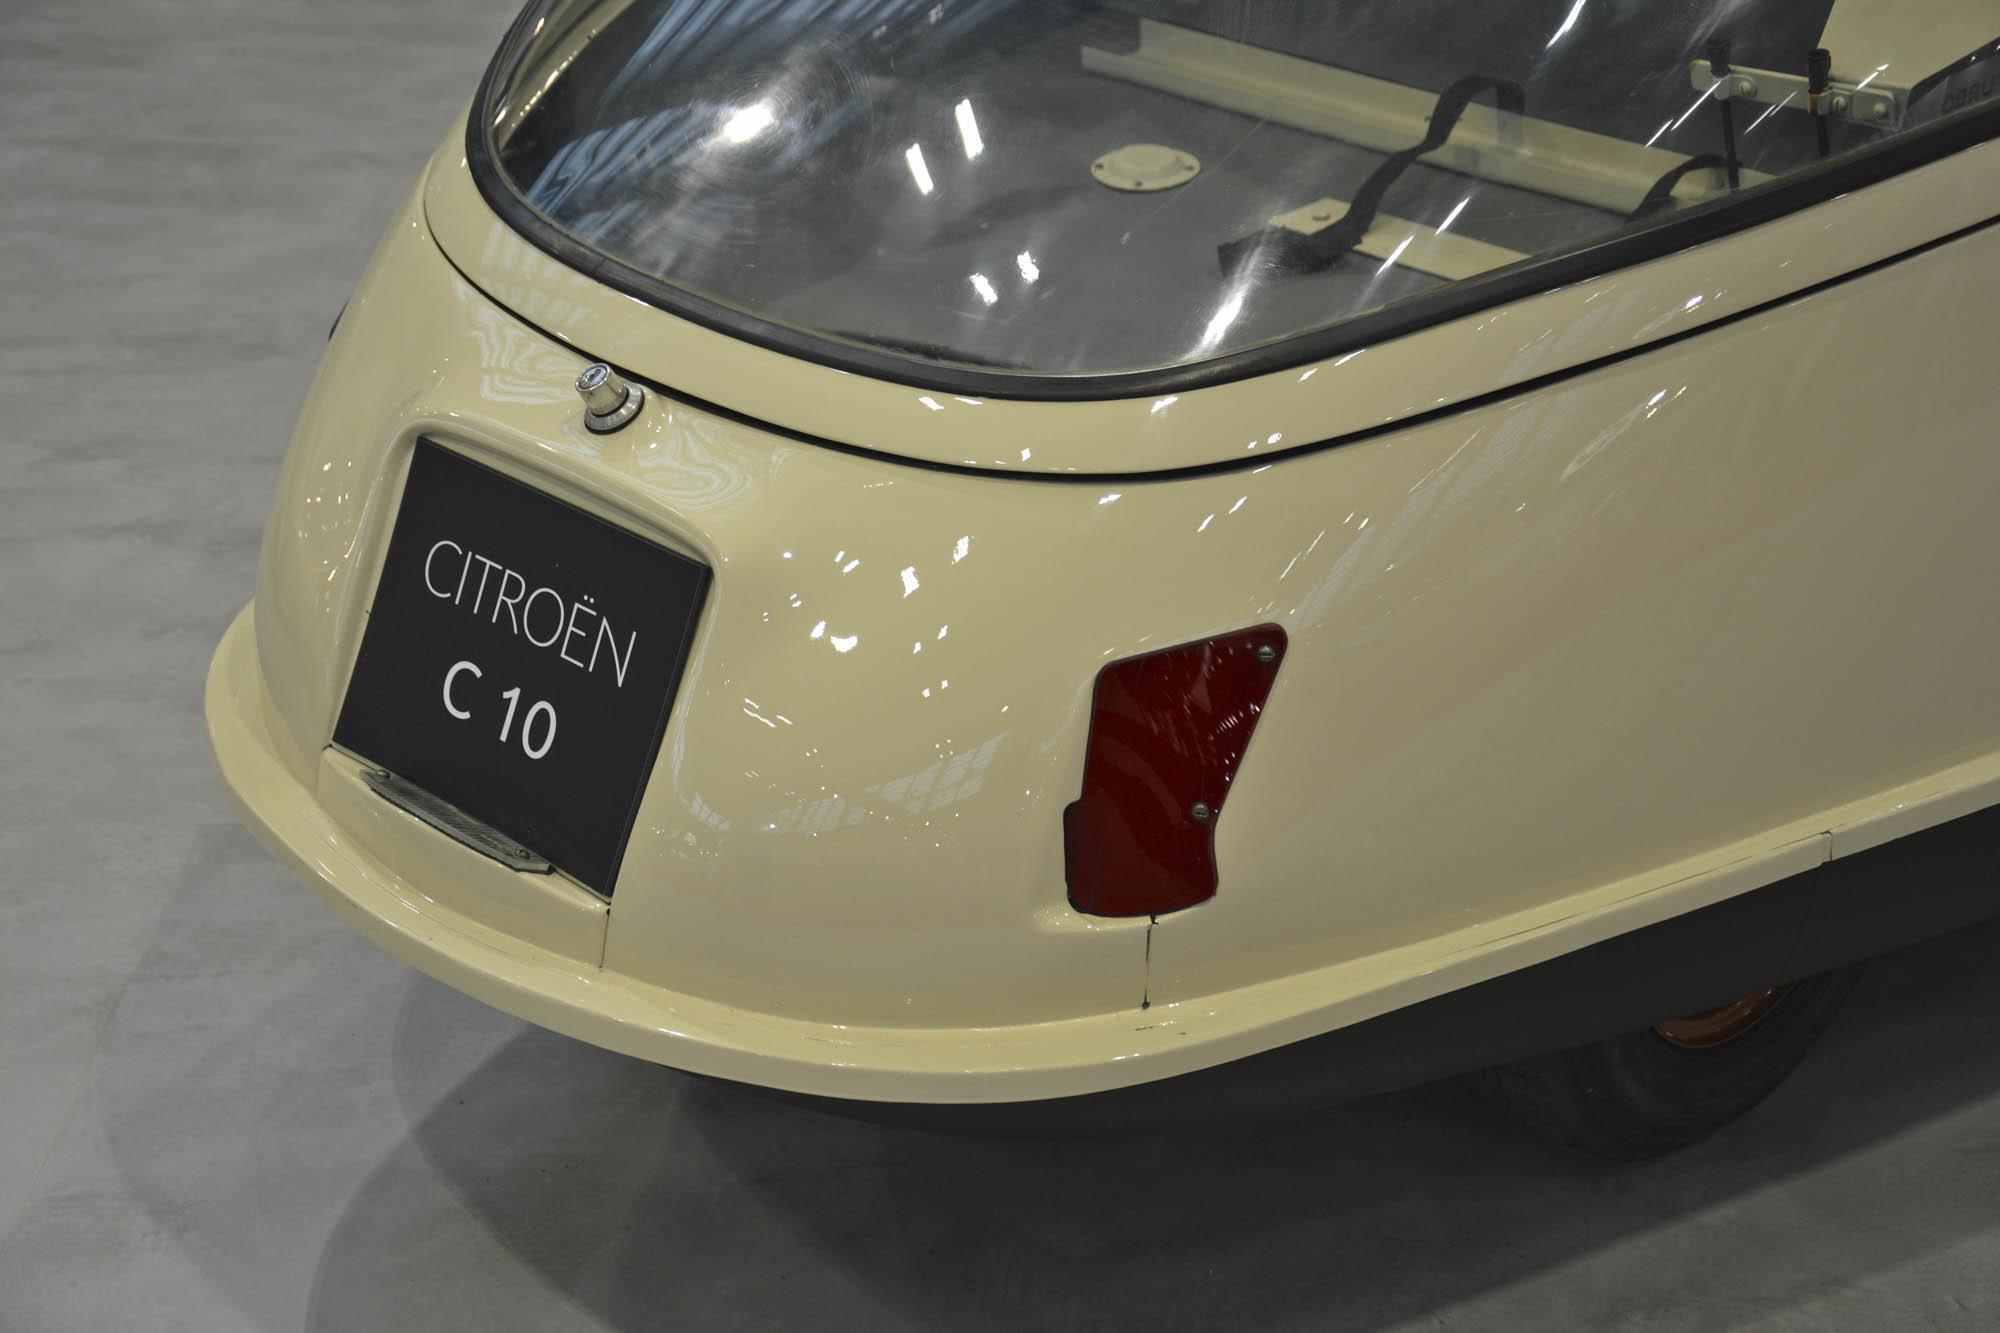 Citroën C10 tail light detail